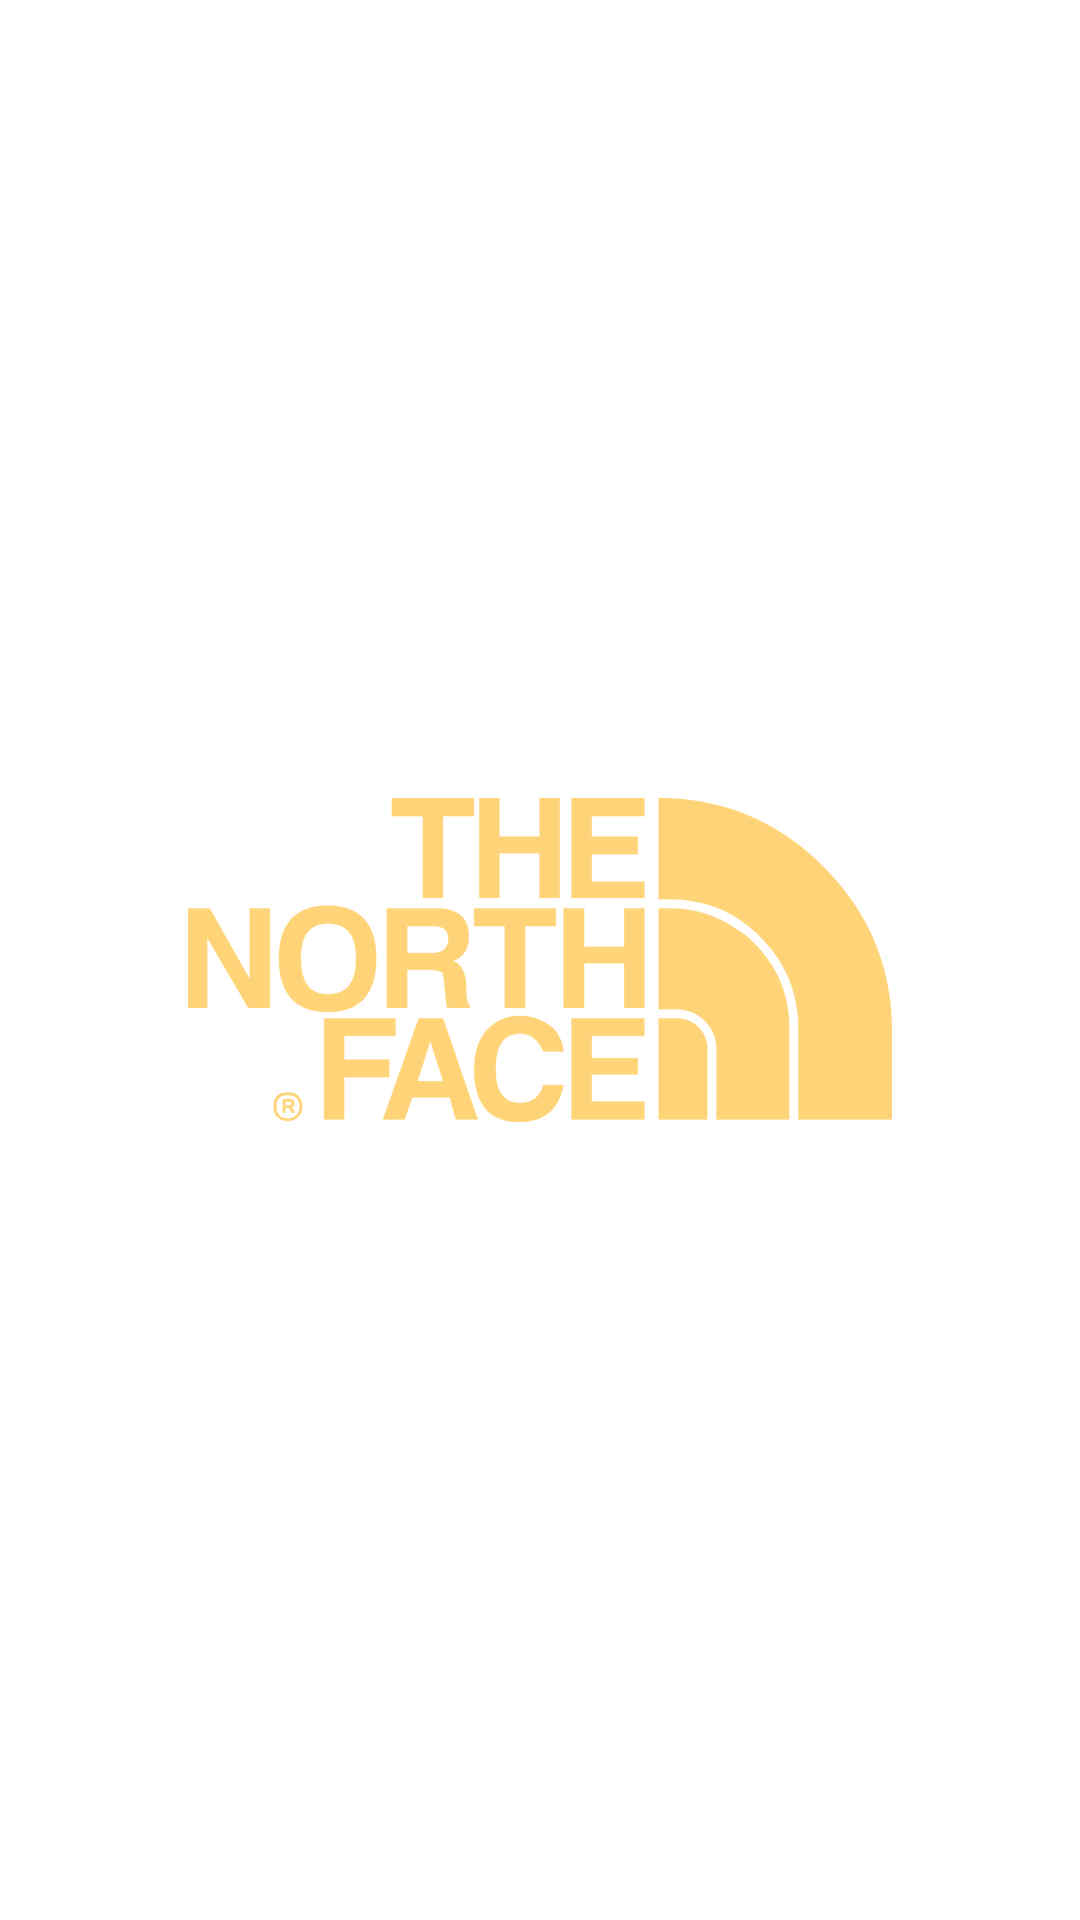 northface10